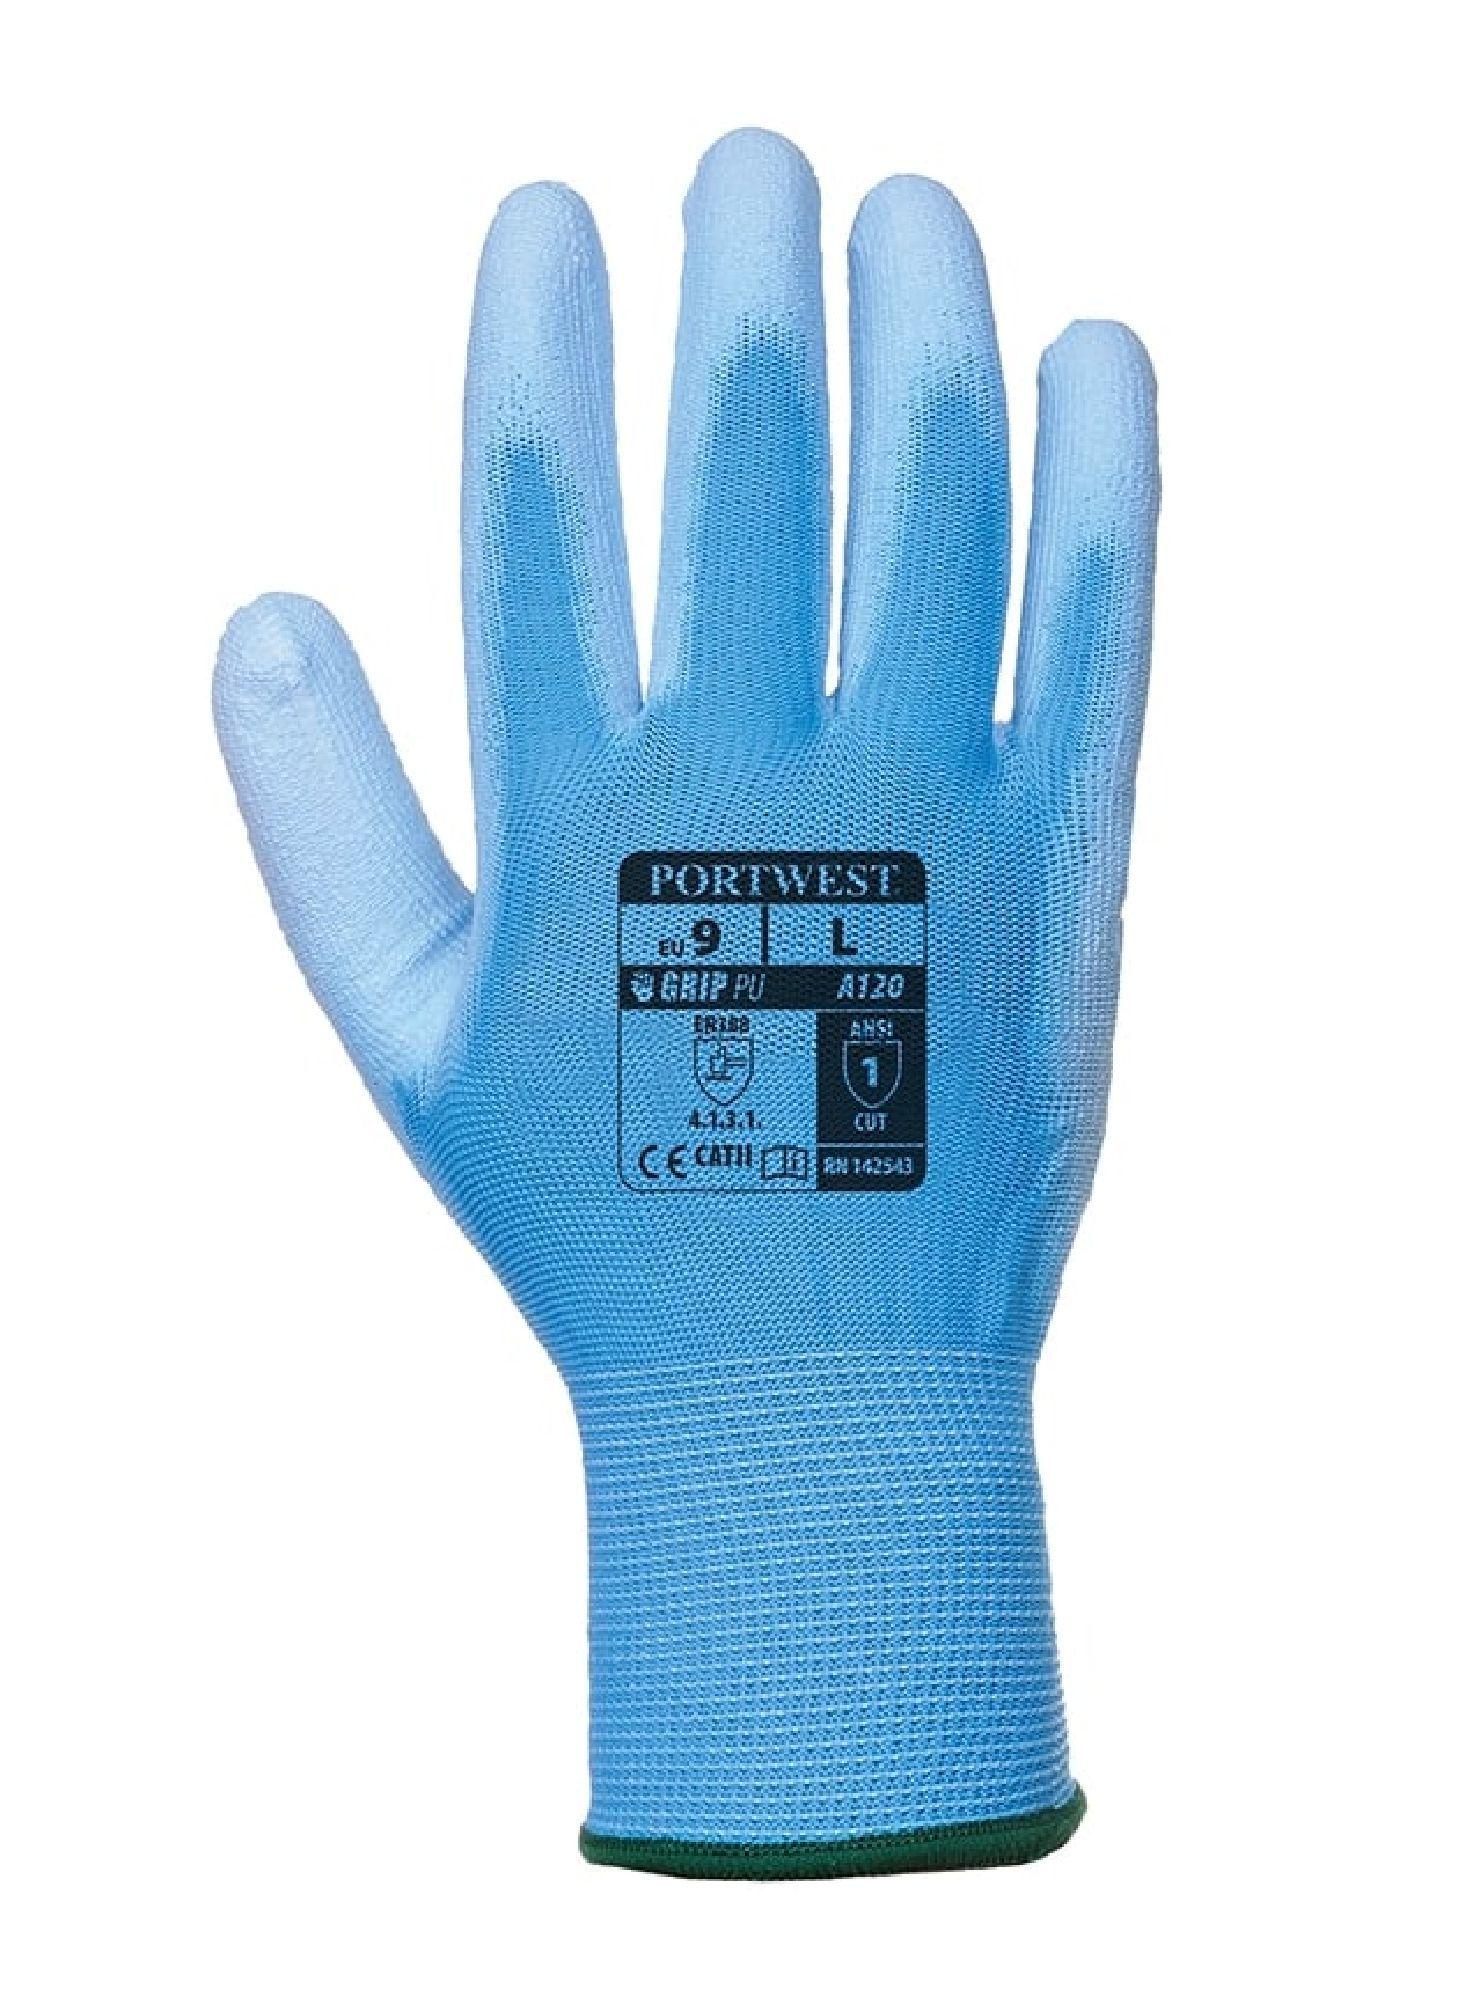 PU Palm-Coated Gloves